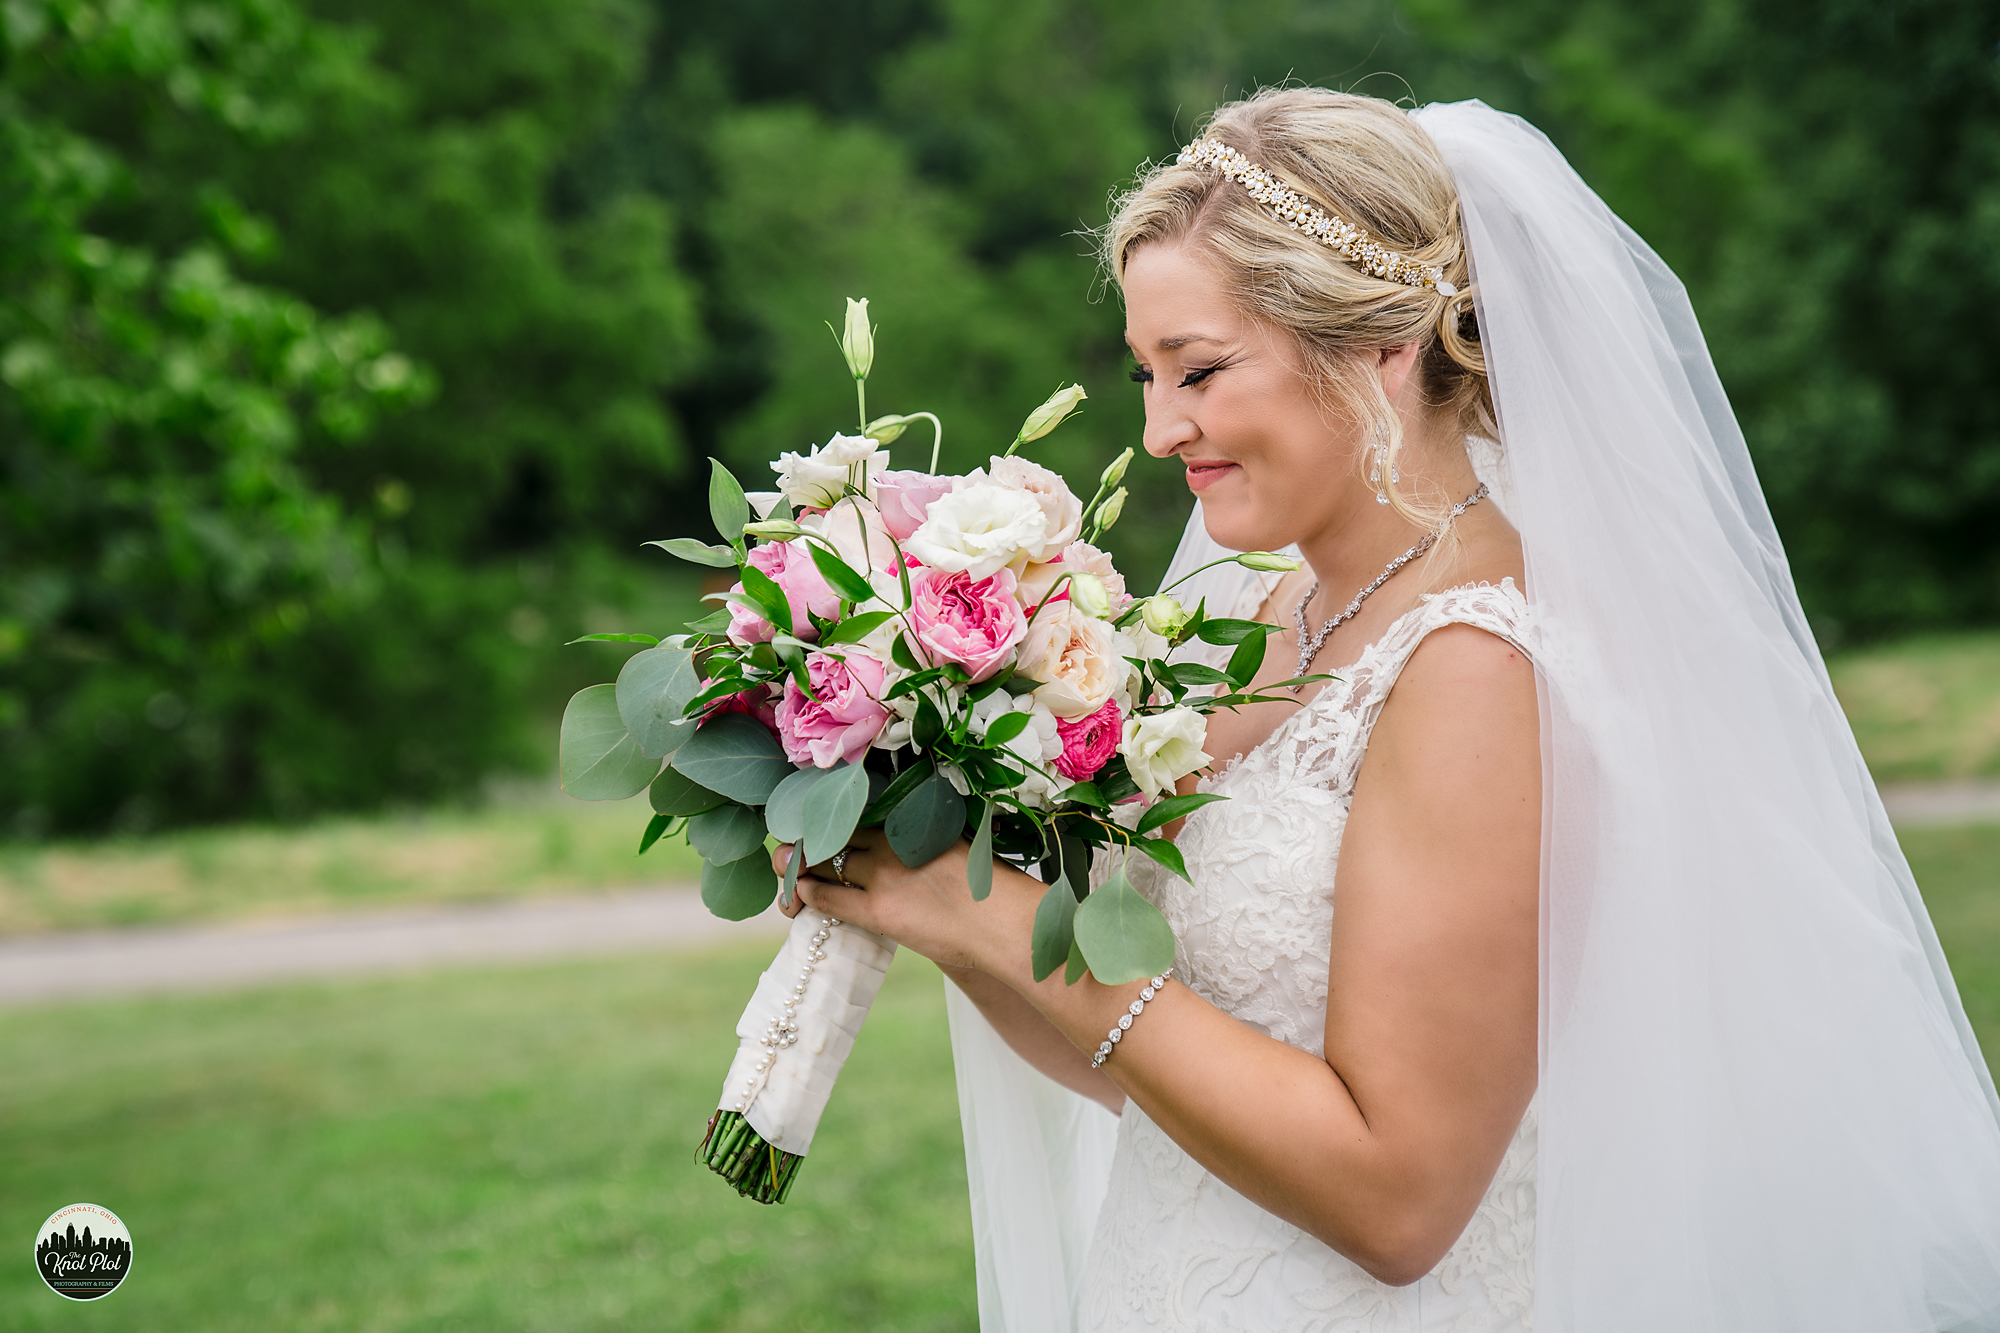 Southgate-Community-Center-KY-Wedding-Photography-9.jpg